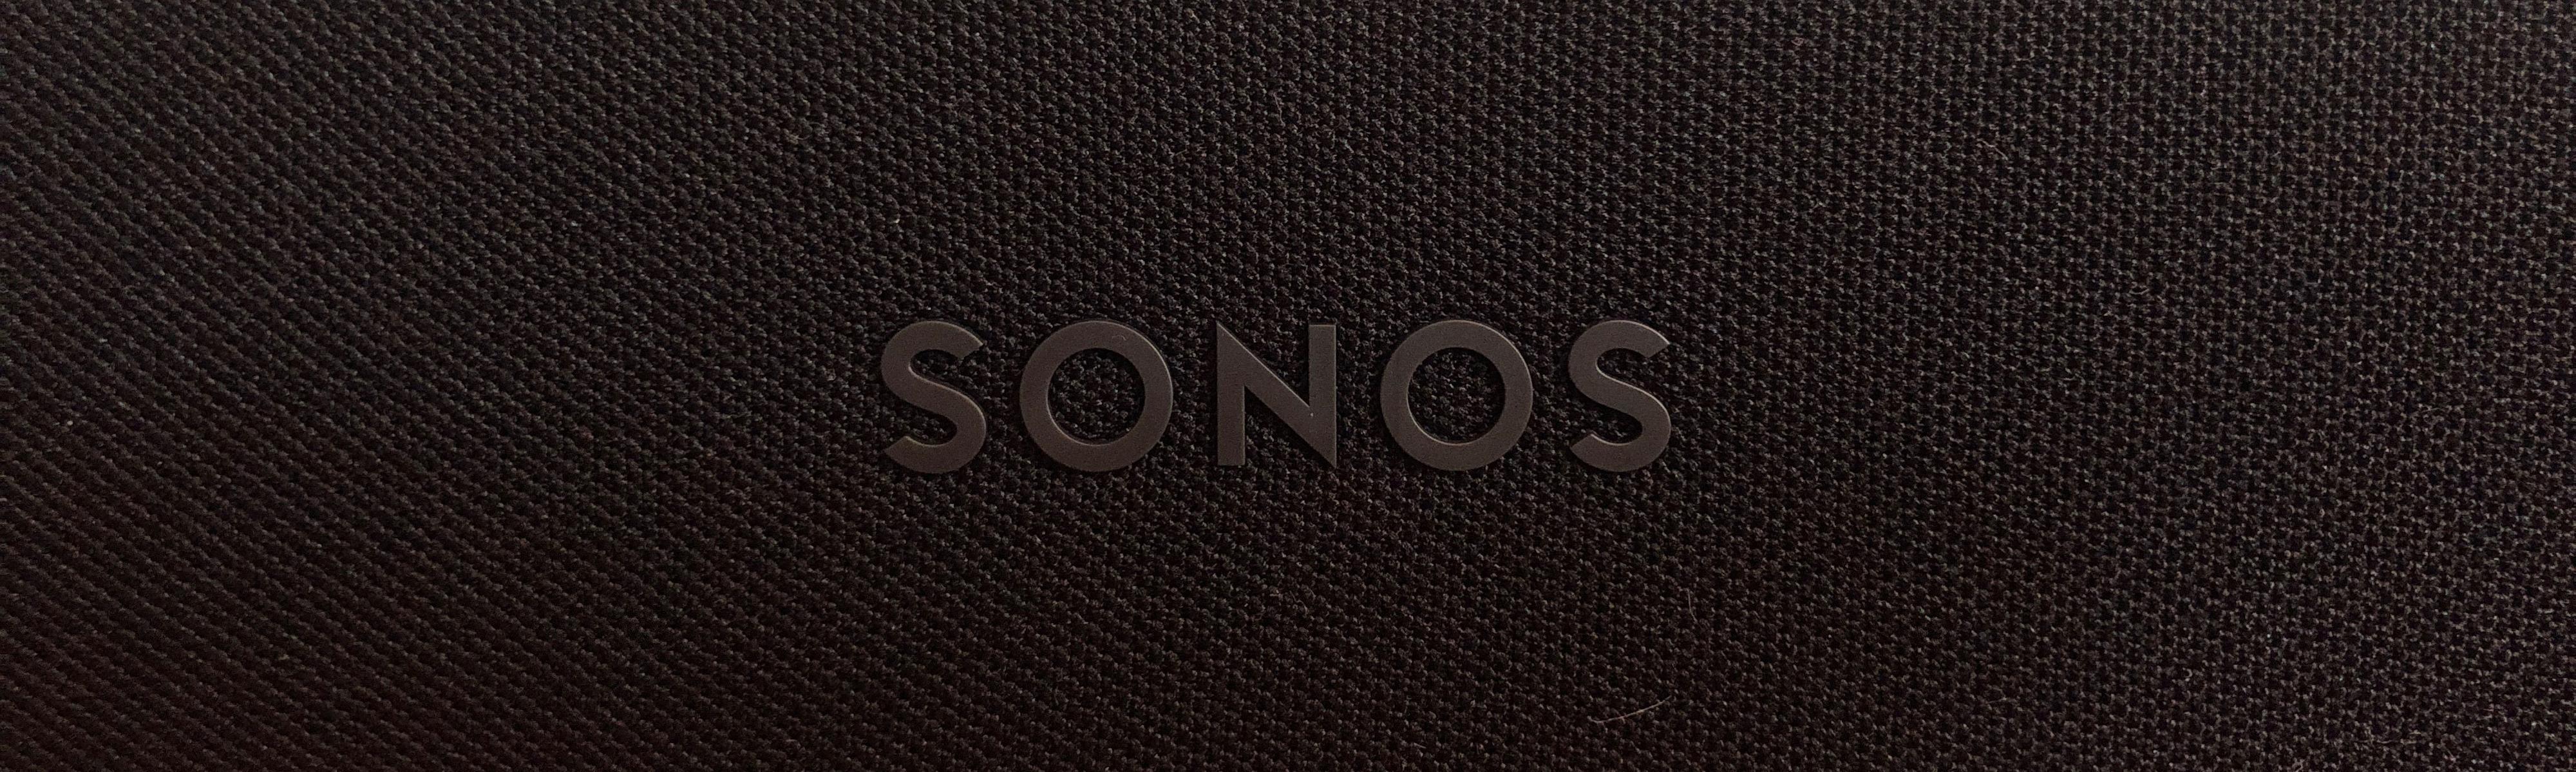 Sonos-logoen er selvfølgelig på plass, midt på den det mye tøystoffet på front.